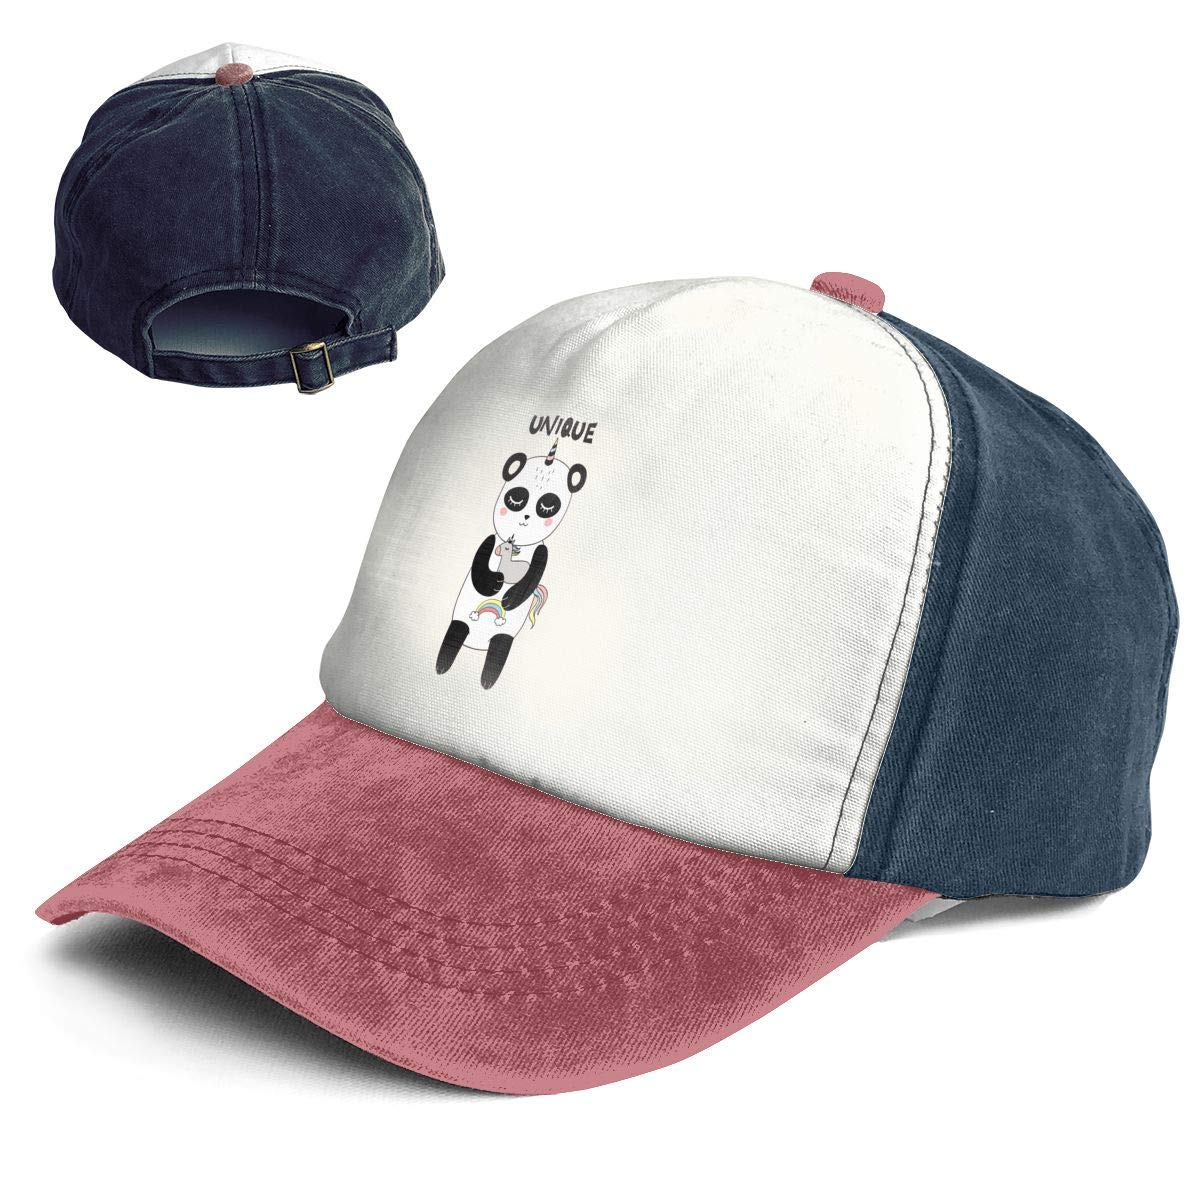 Fashion Vintage Hat Lovely Unicorn Panda Adjustable Dad Hat Baseball Cowboy Cap